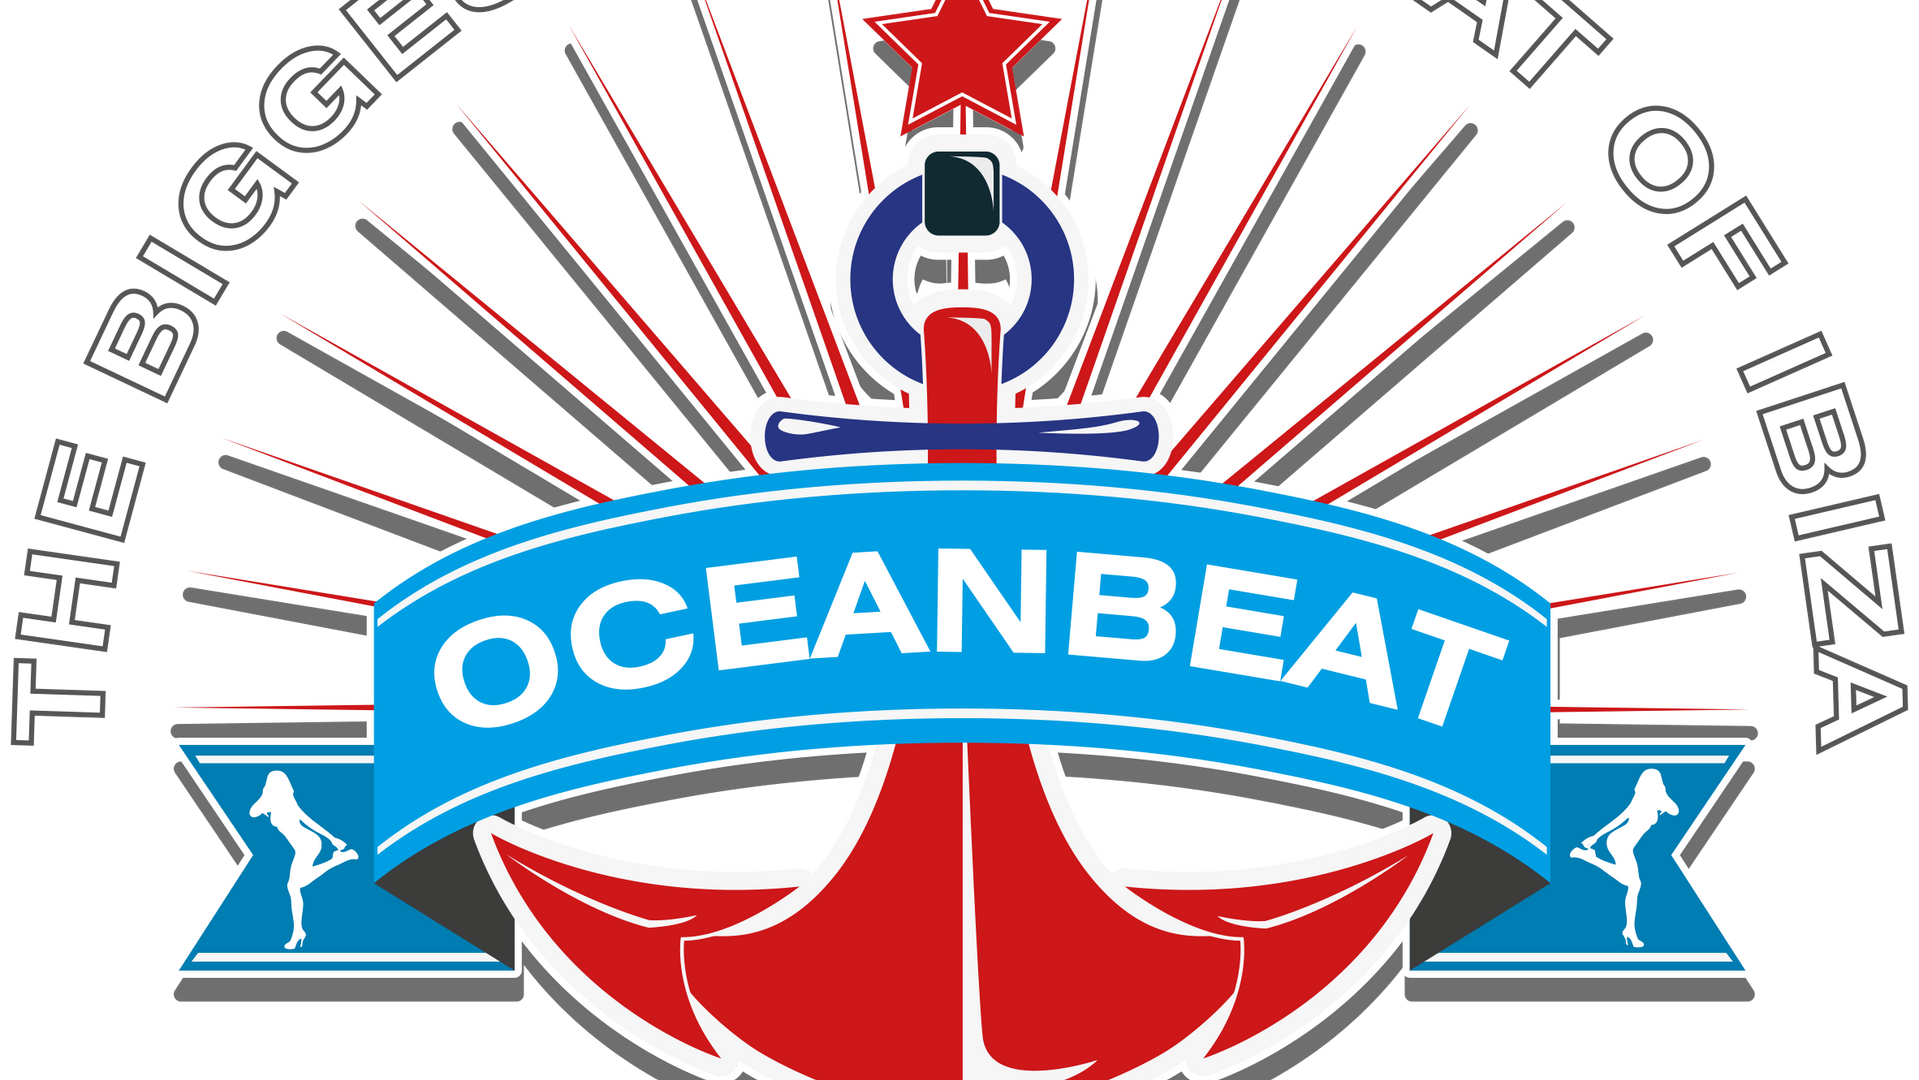 oceanbeat-logo-png.png